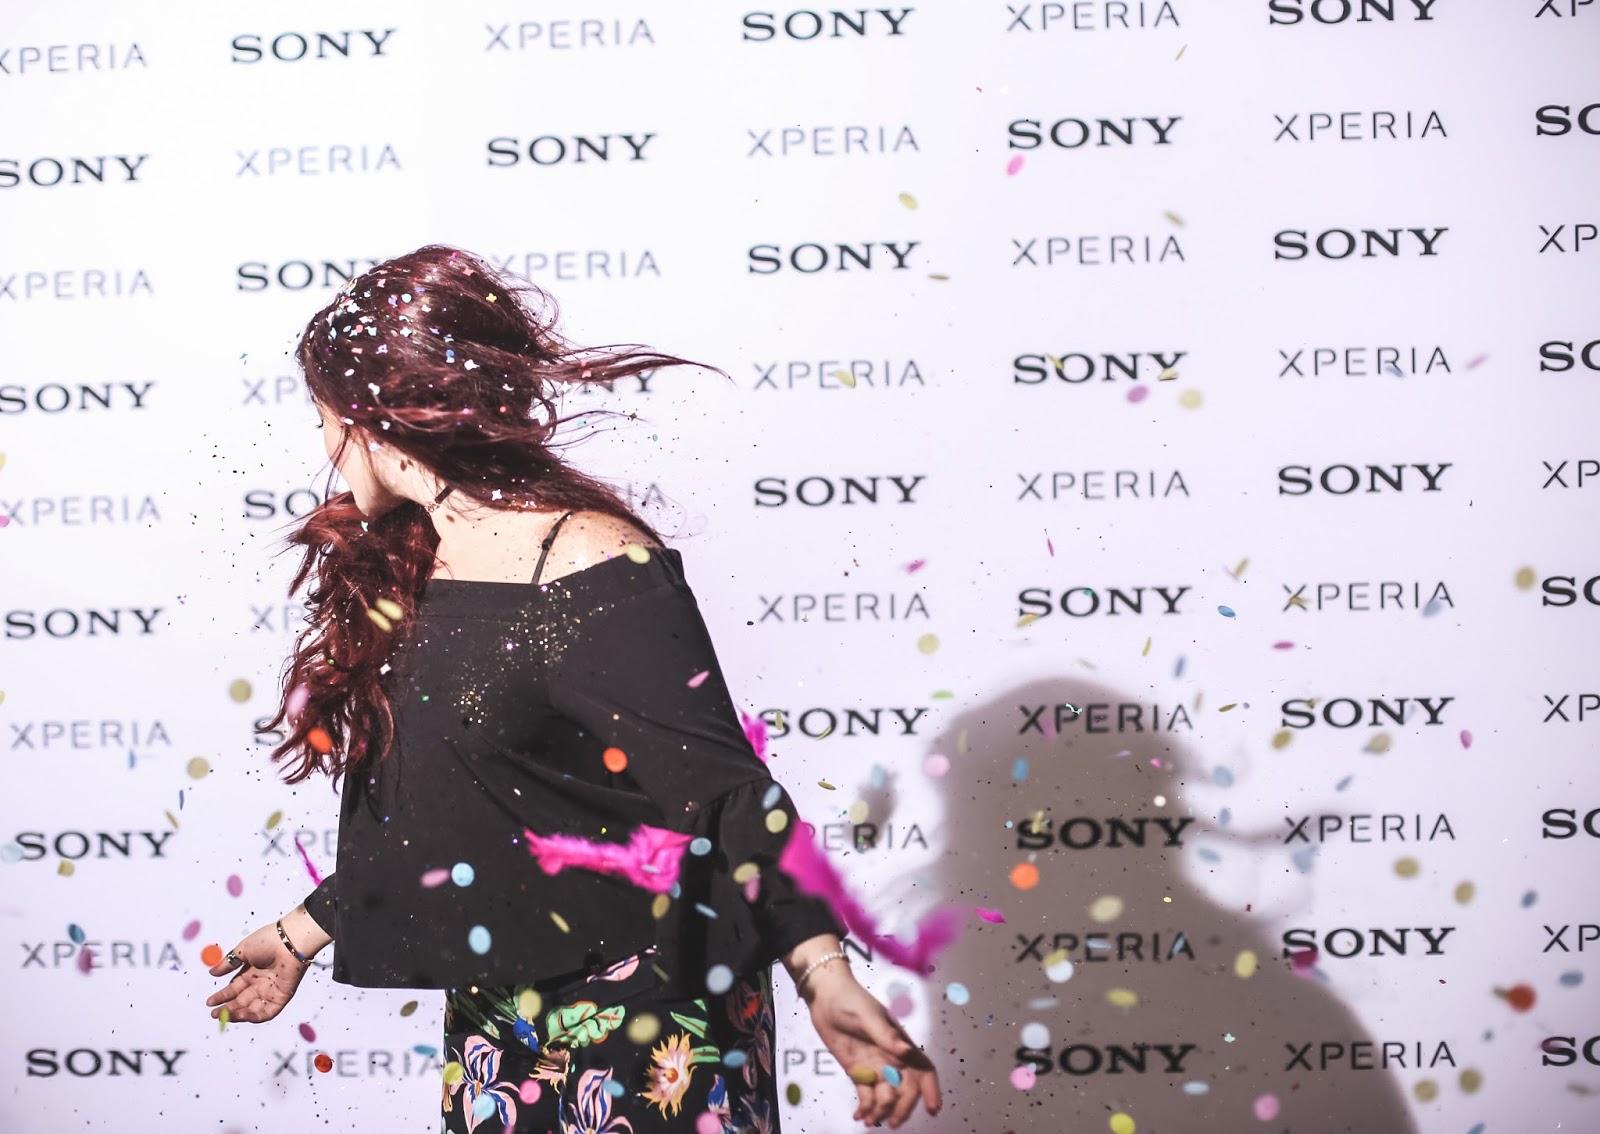 Sony Xperia XZ Premium super slowmotion venus is naive